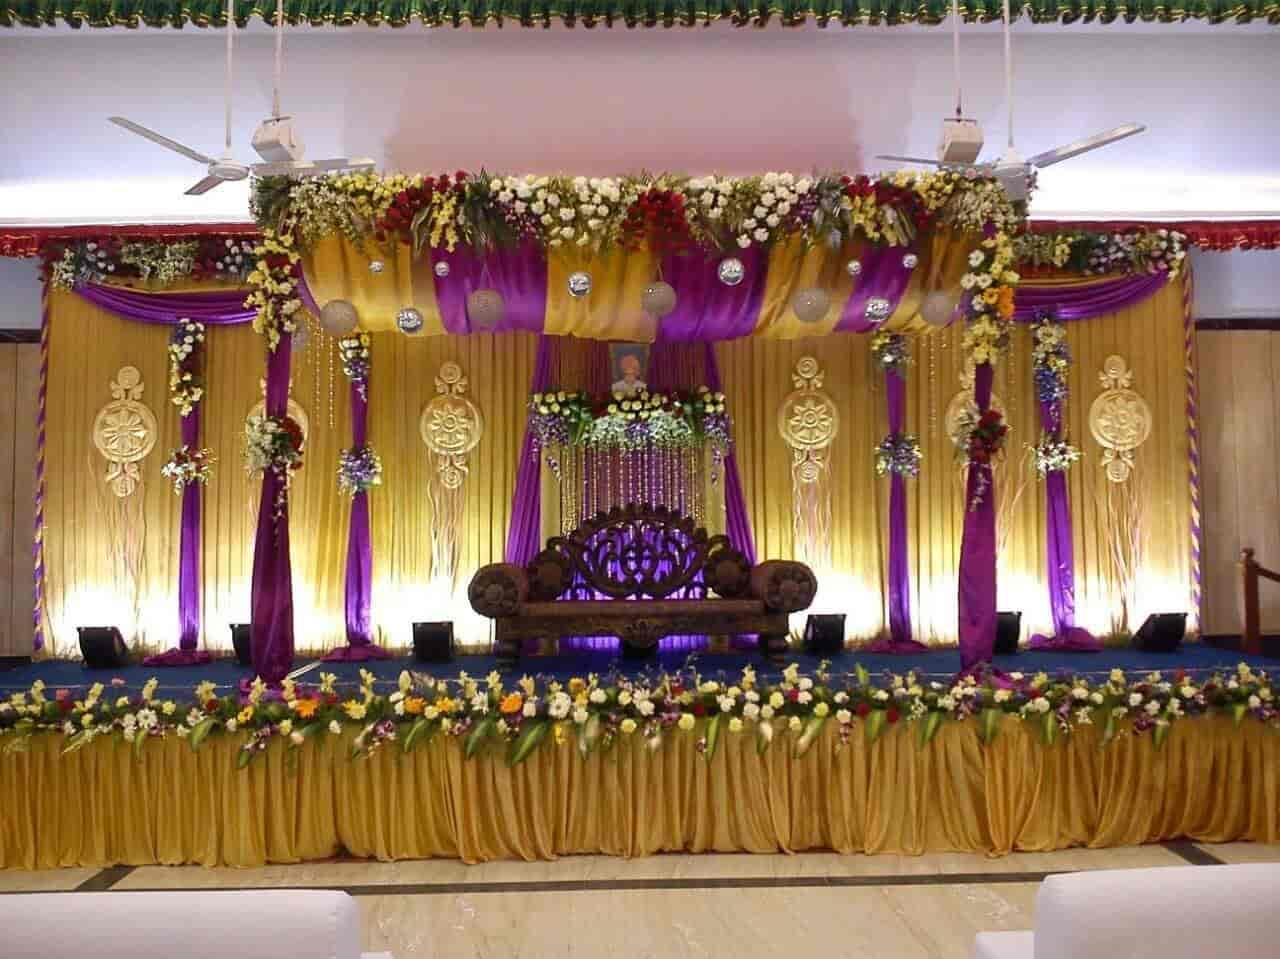 Shreya florist wedding decorator aminjikarai balloon decorators shreya florist wedding decorator aminjikarai balloon decorators in chennai justdial junglespirit Choice Image